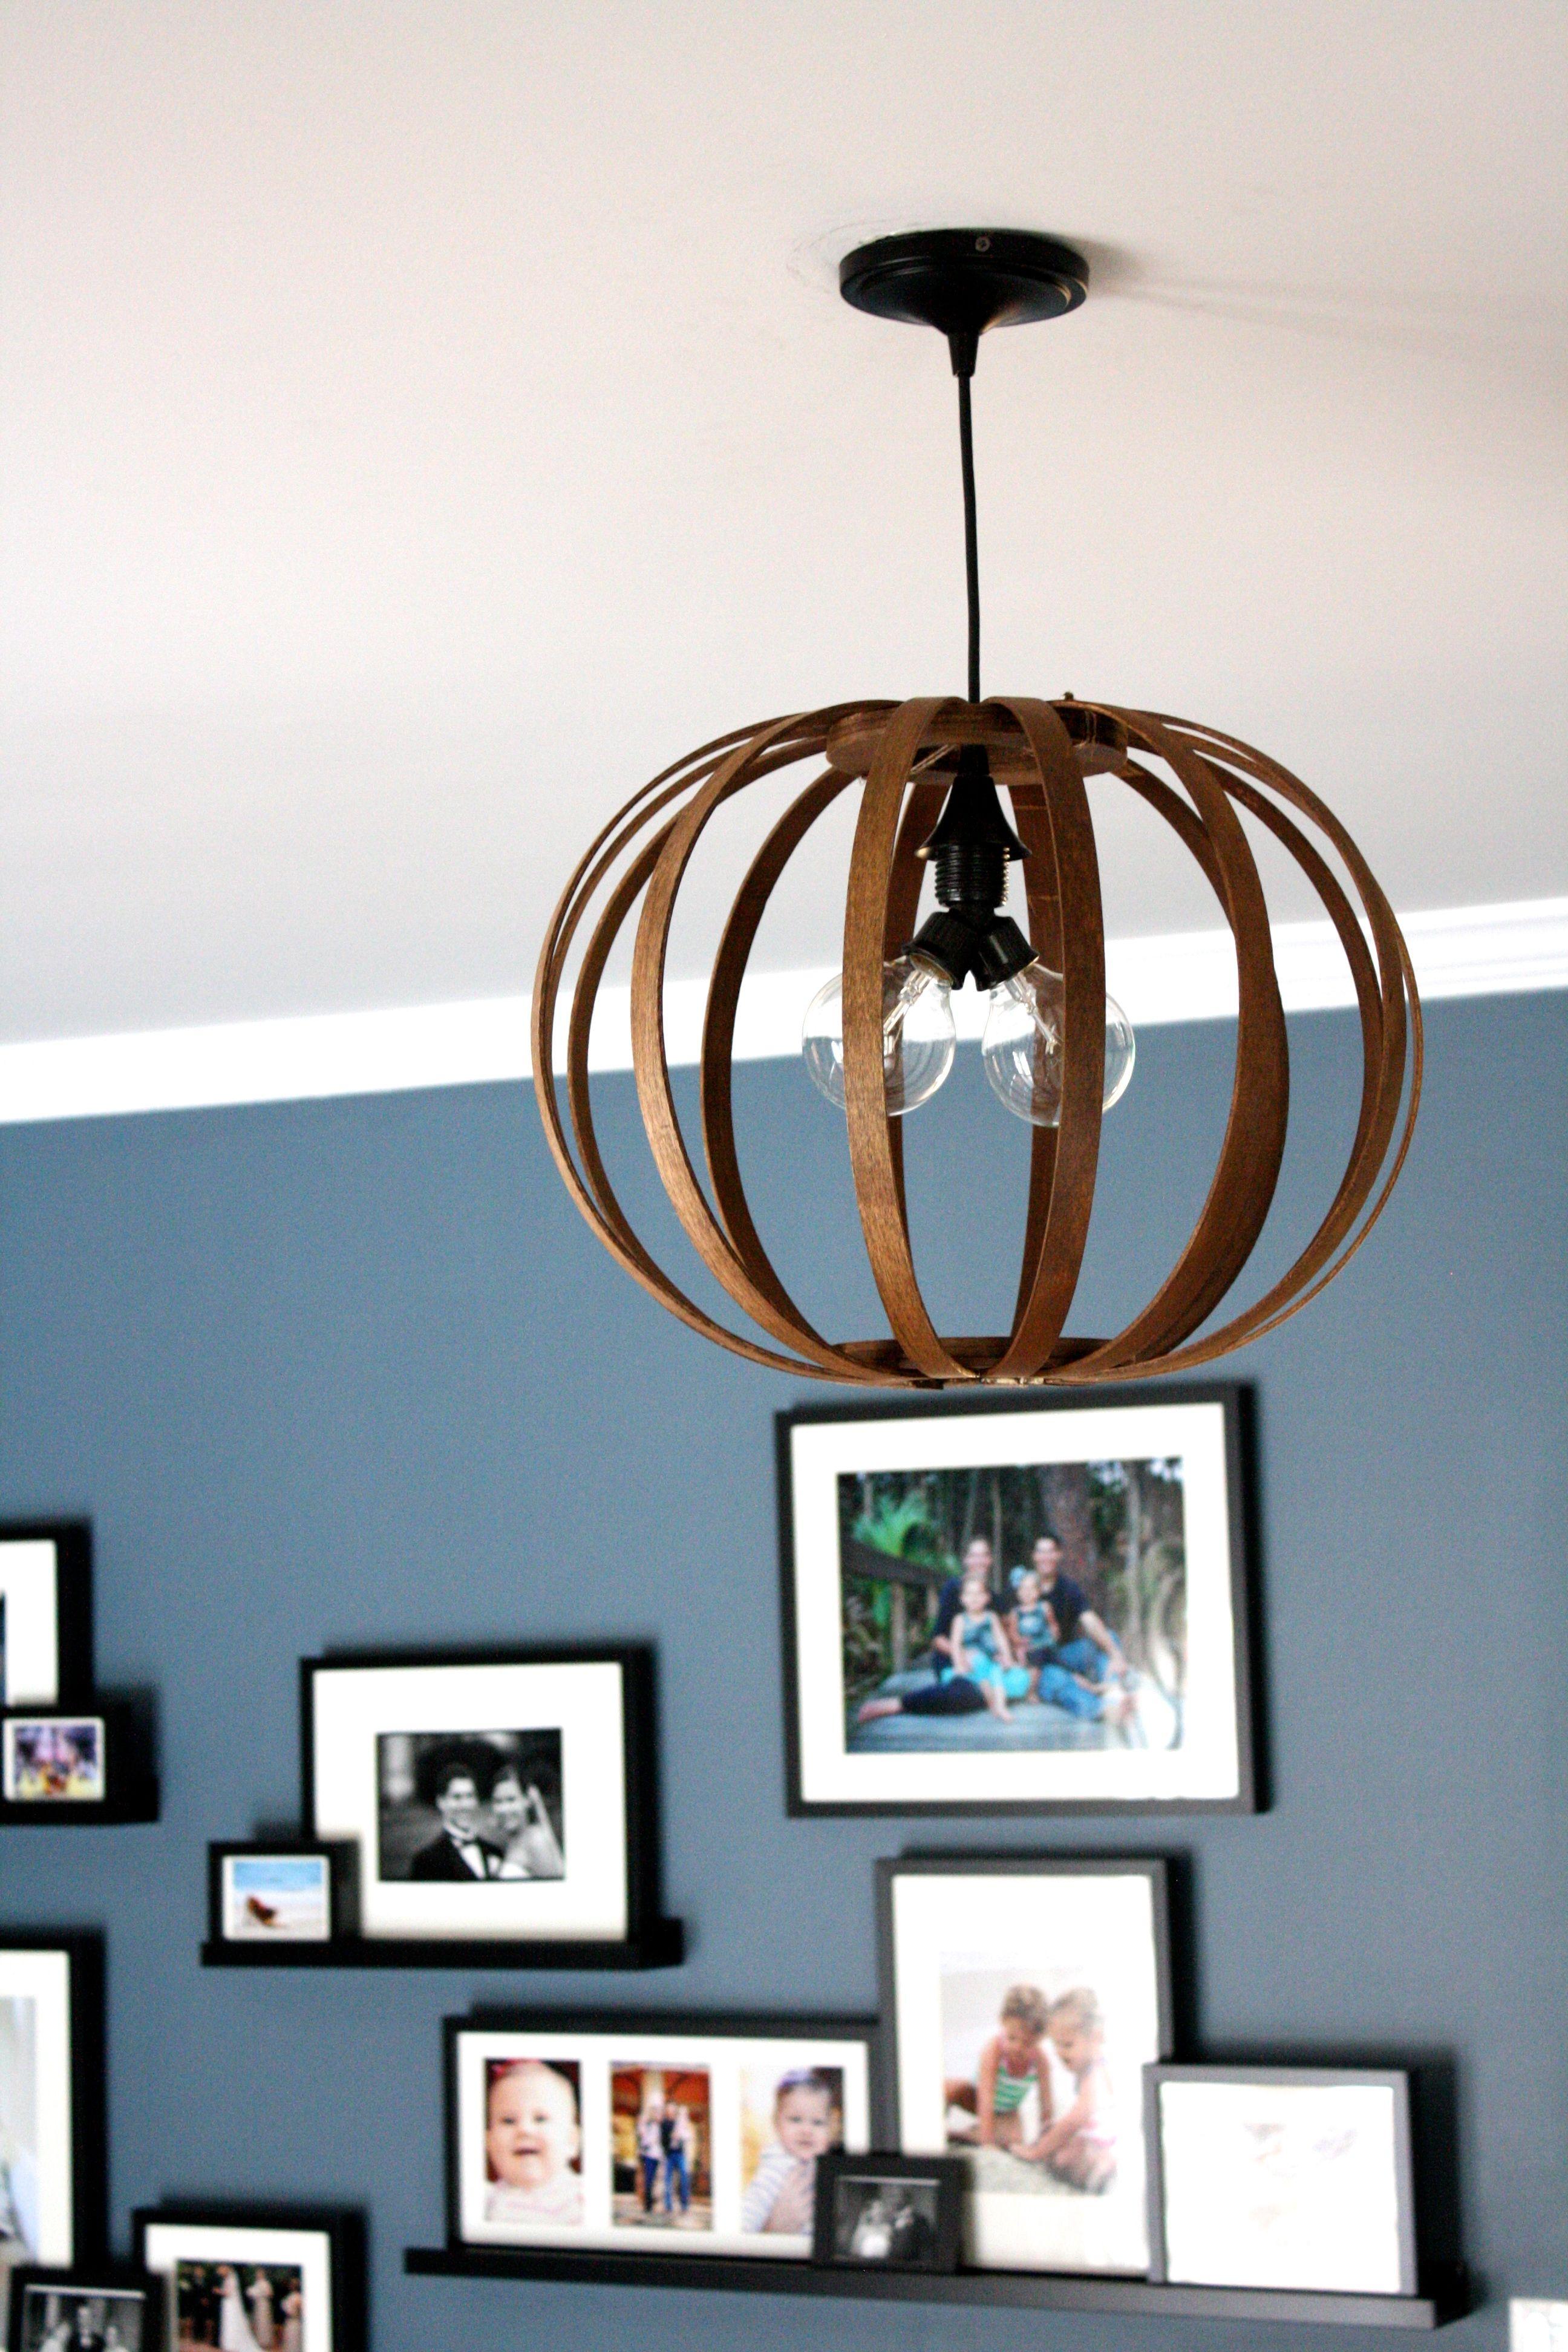 westelm lighting. Totally Genius Idea For Making A West Elm Knock Off Bentwood Pendant Light Westelm Lighting S